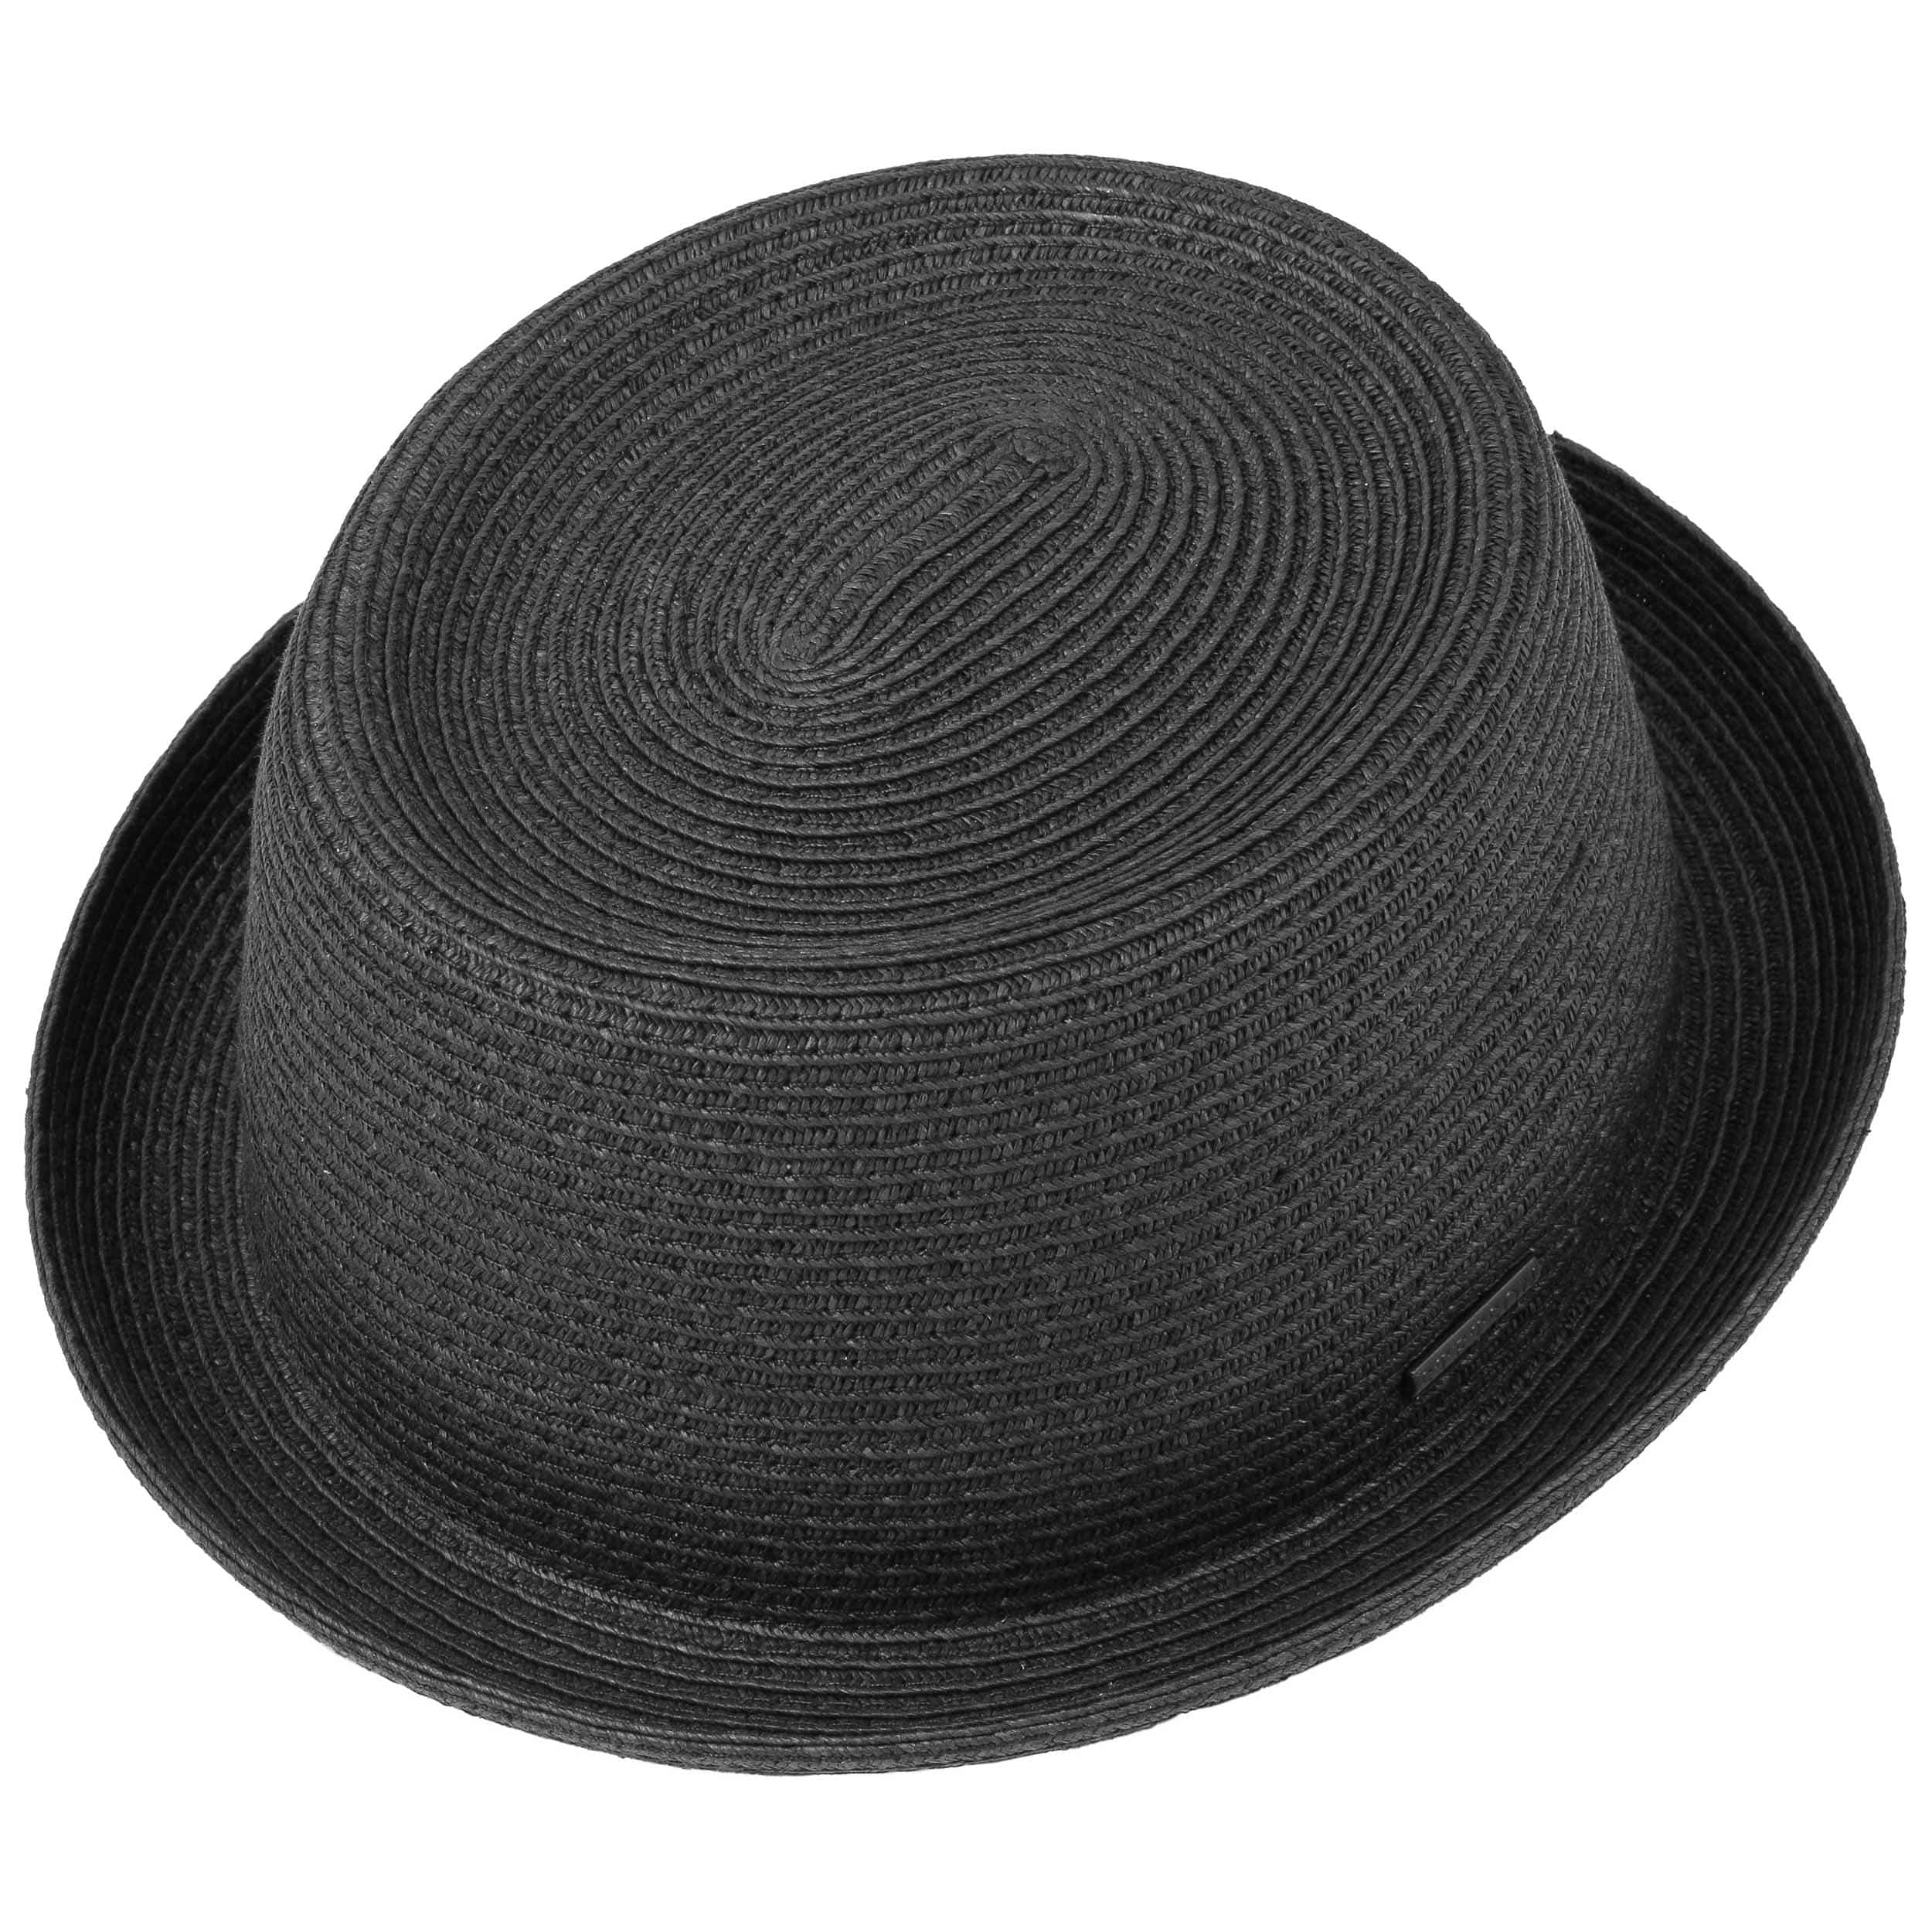 5784dbc6243ef Dawson Black Pork Pie Straw Hat by Stetson - black 1 ...